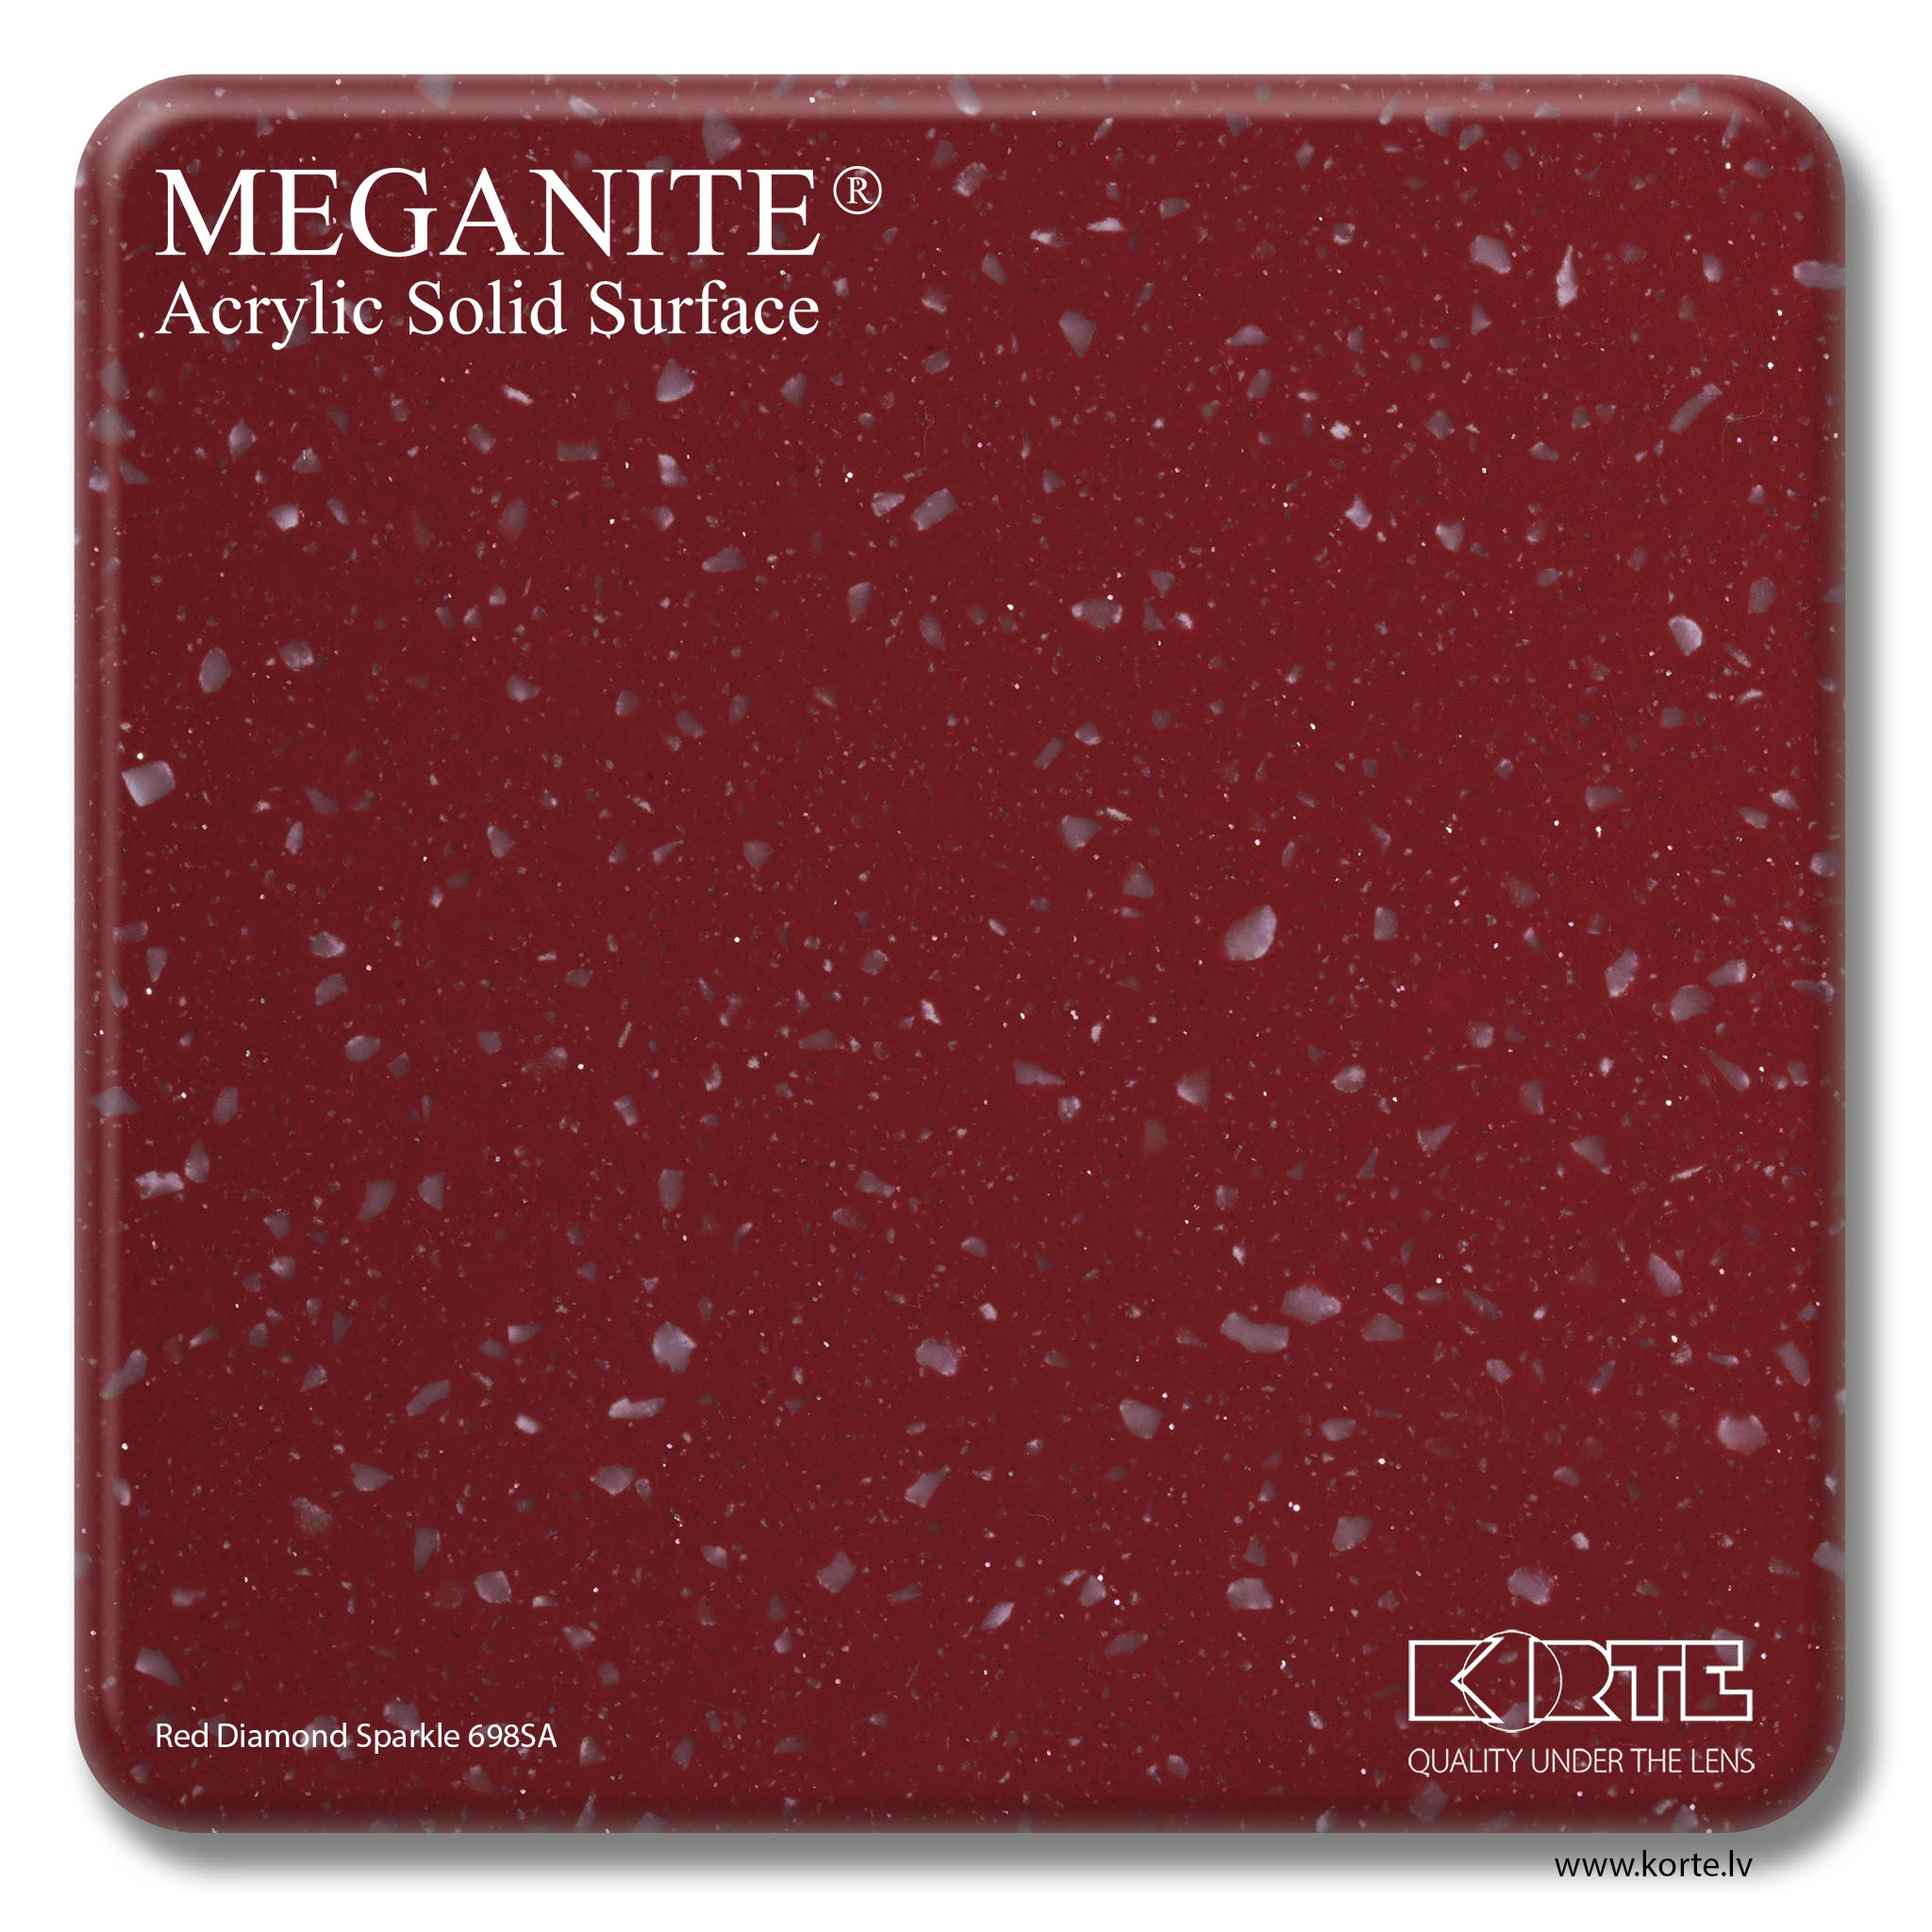 Meganite Red Diamond Sparkle 698SA